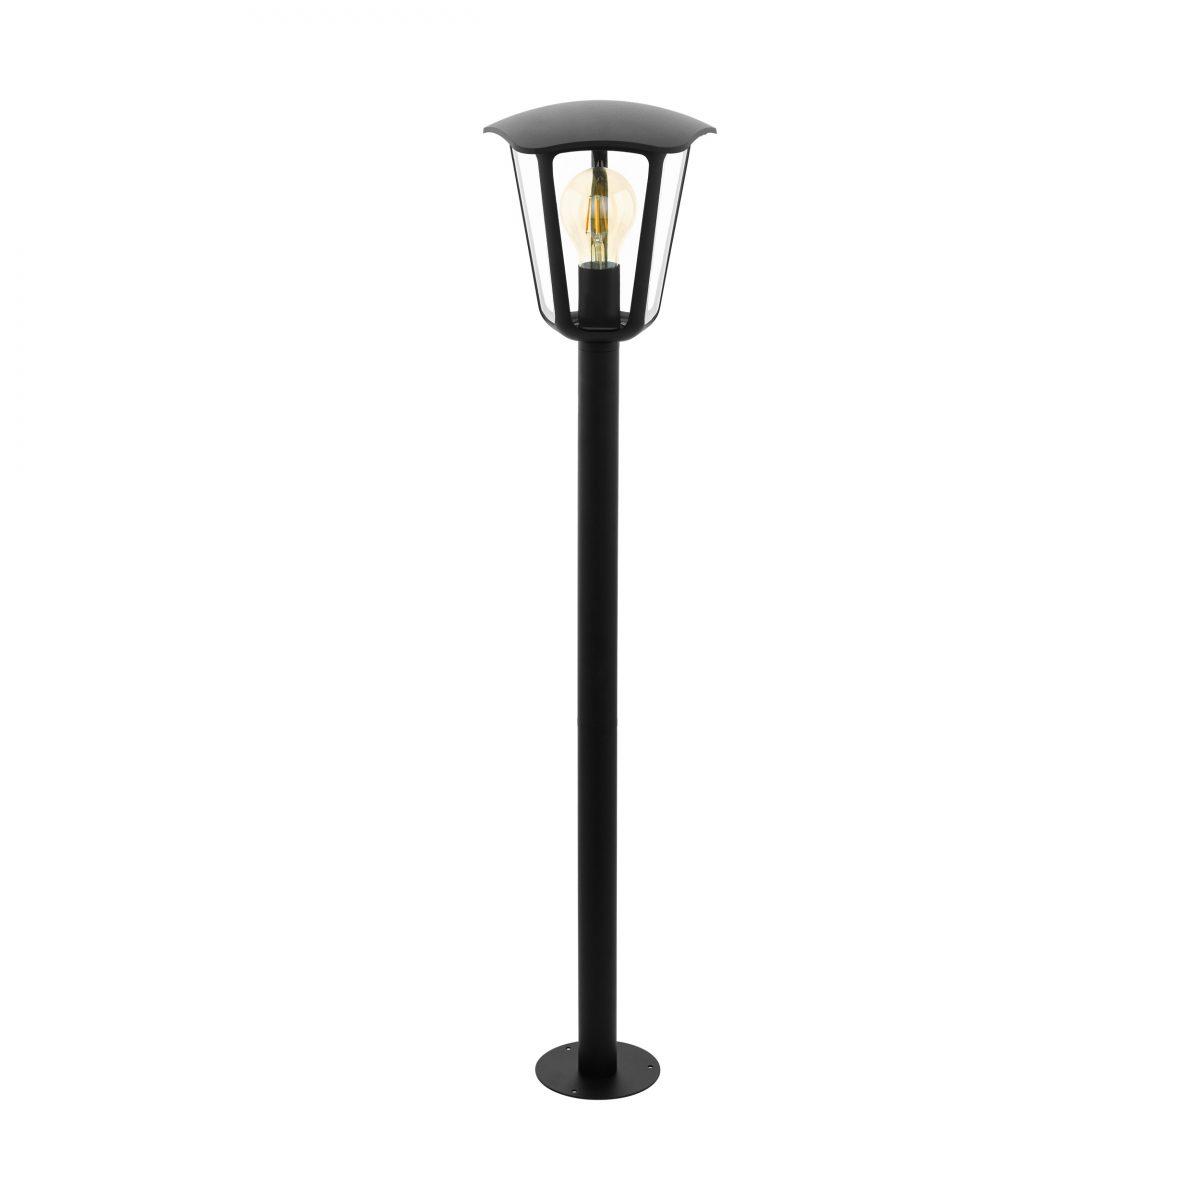 Світильник вуличний MONREALE EGLO 98123 - Фото №28